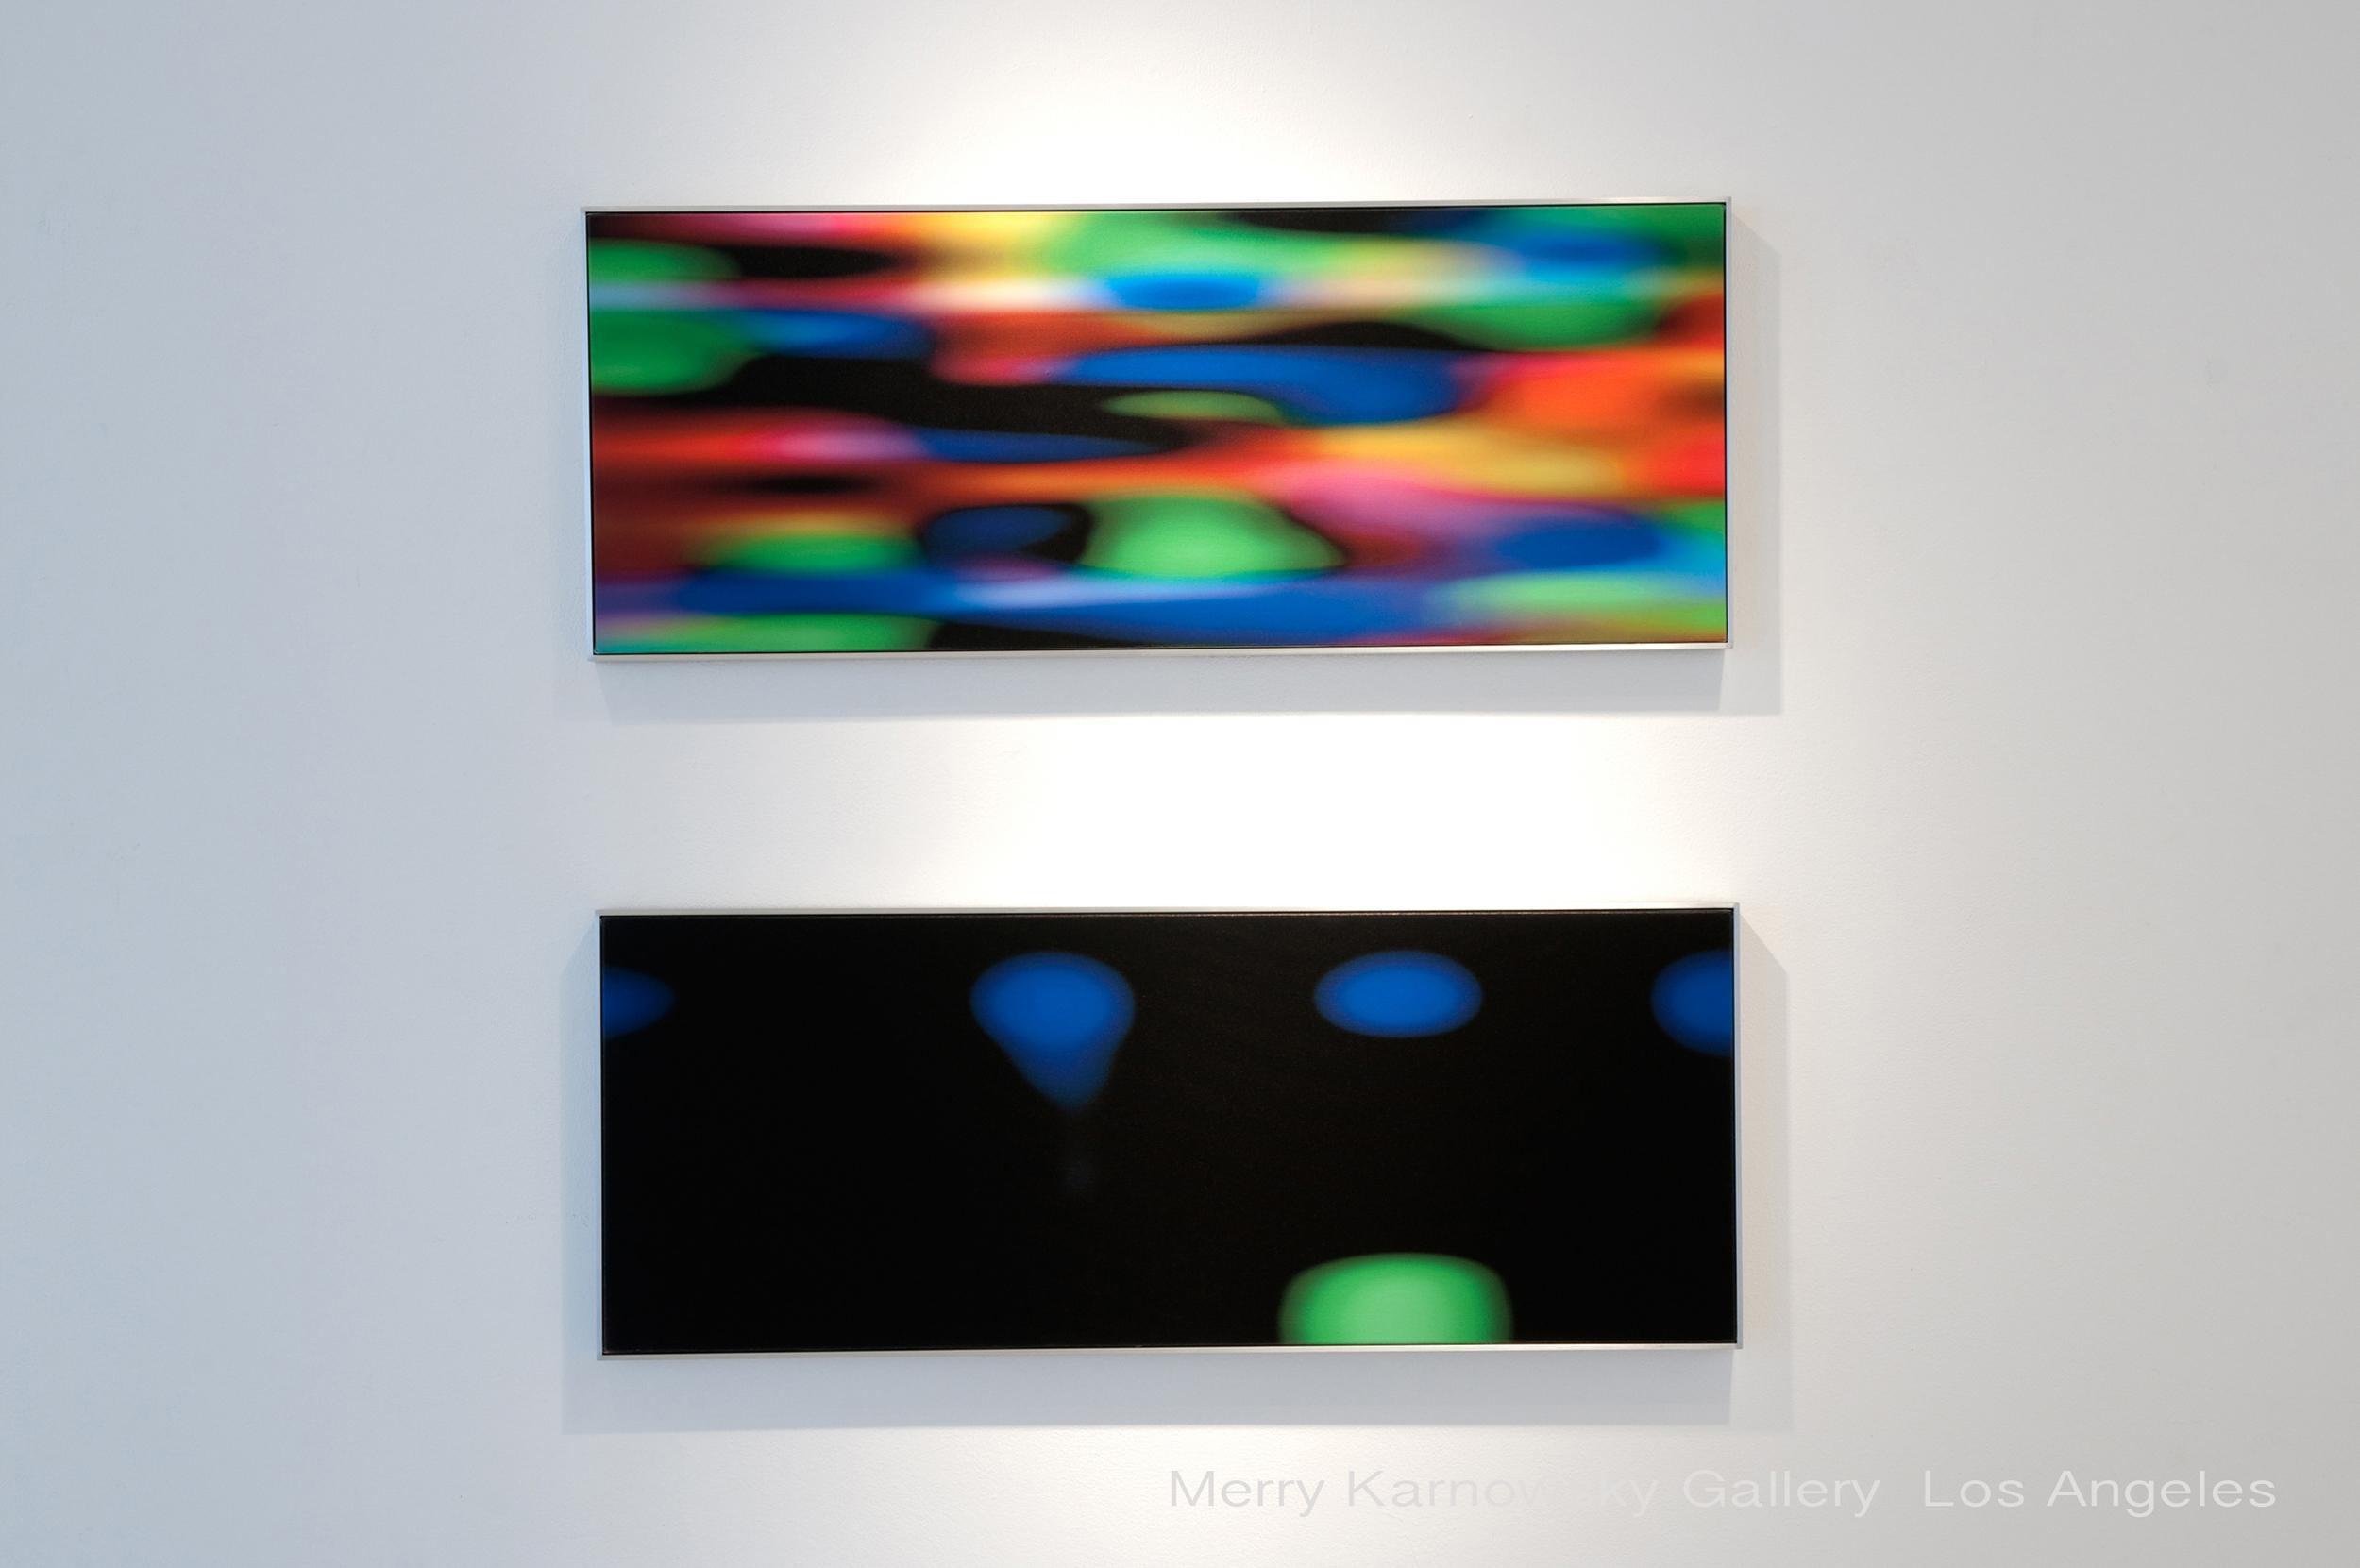 09. color beyond merry karnowski gallery 05 cropped.jpg